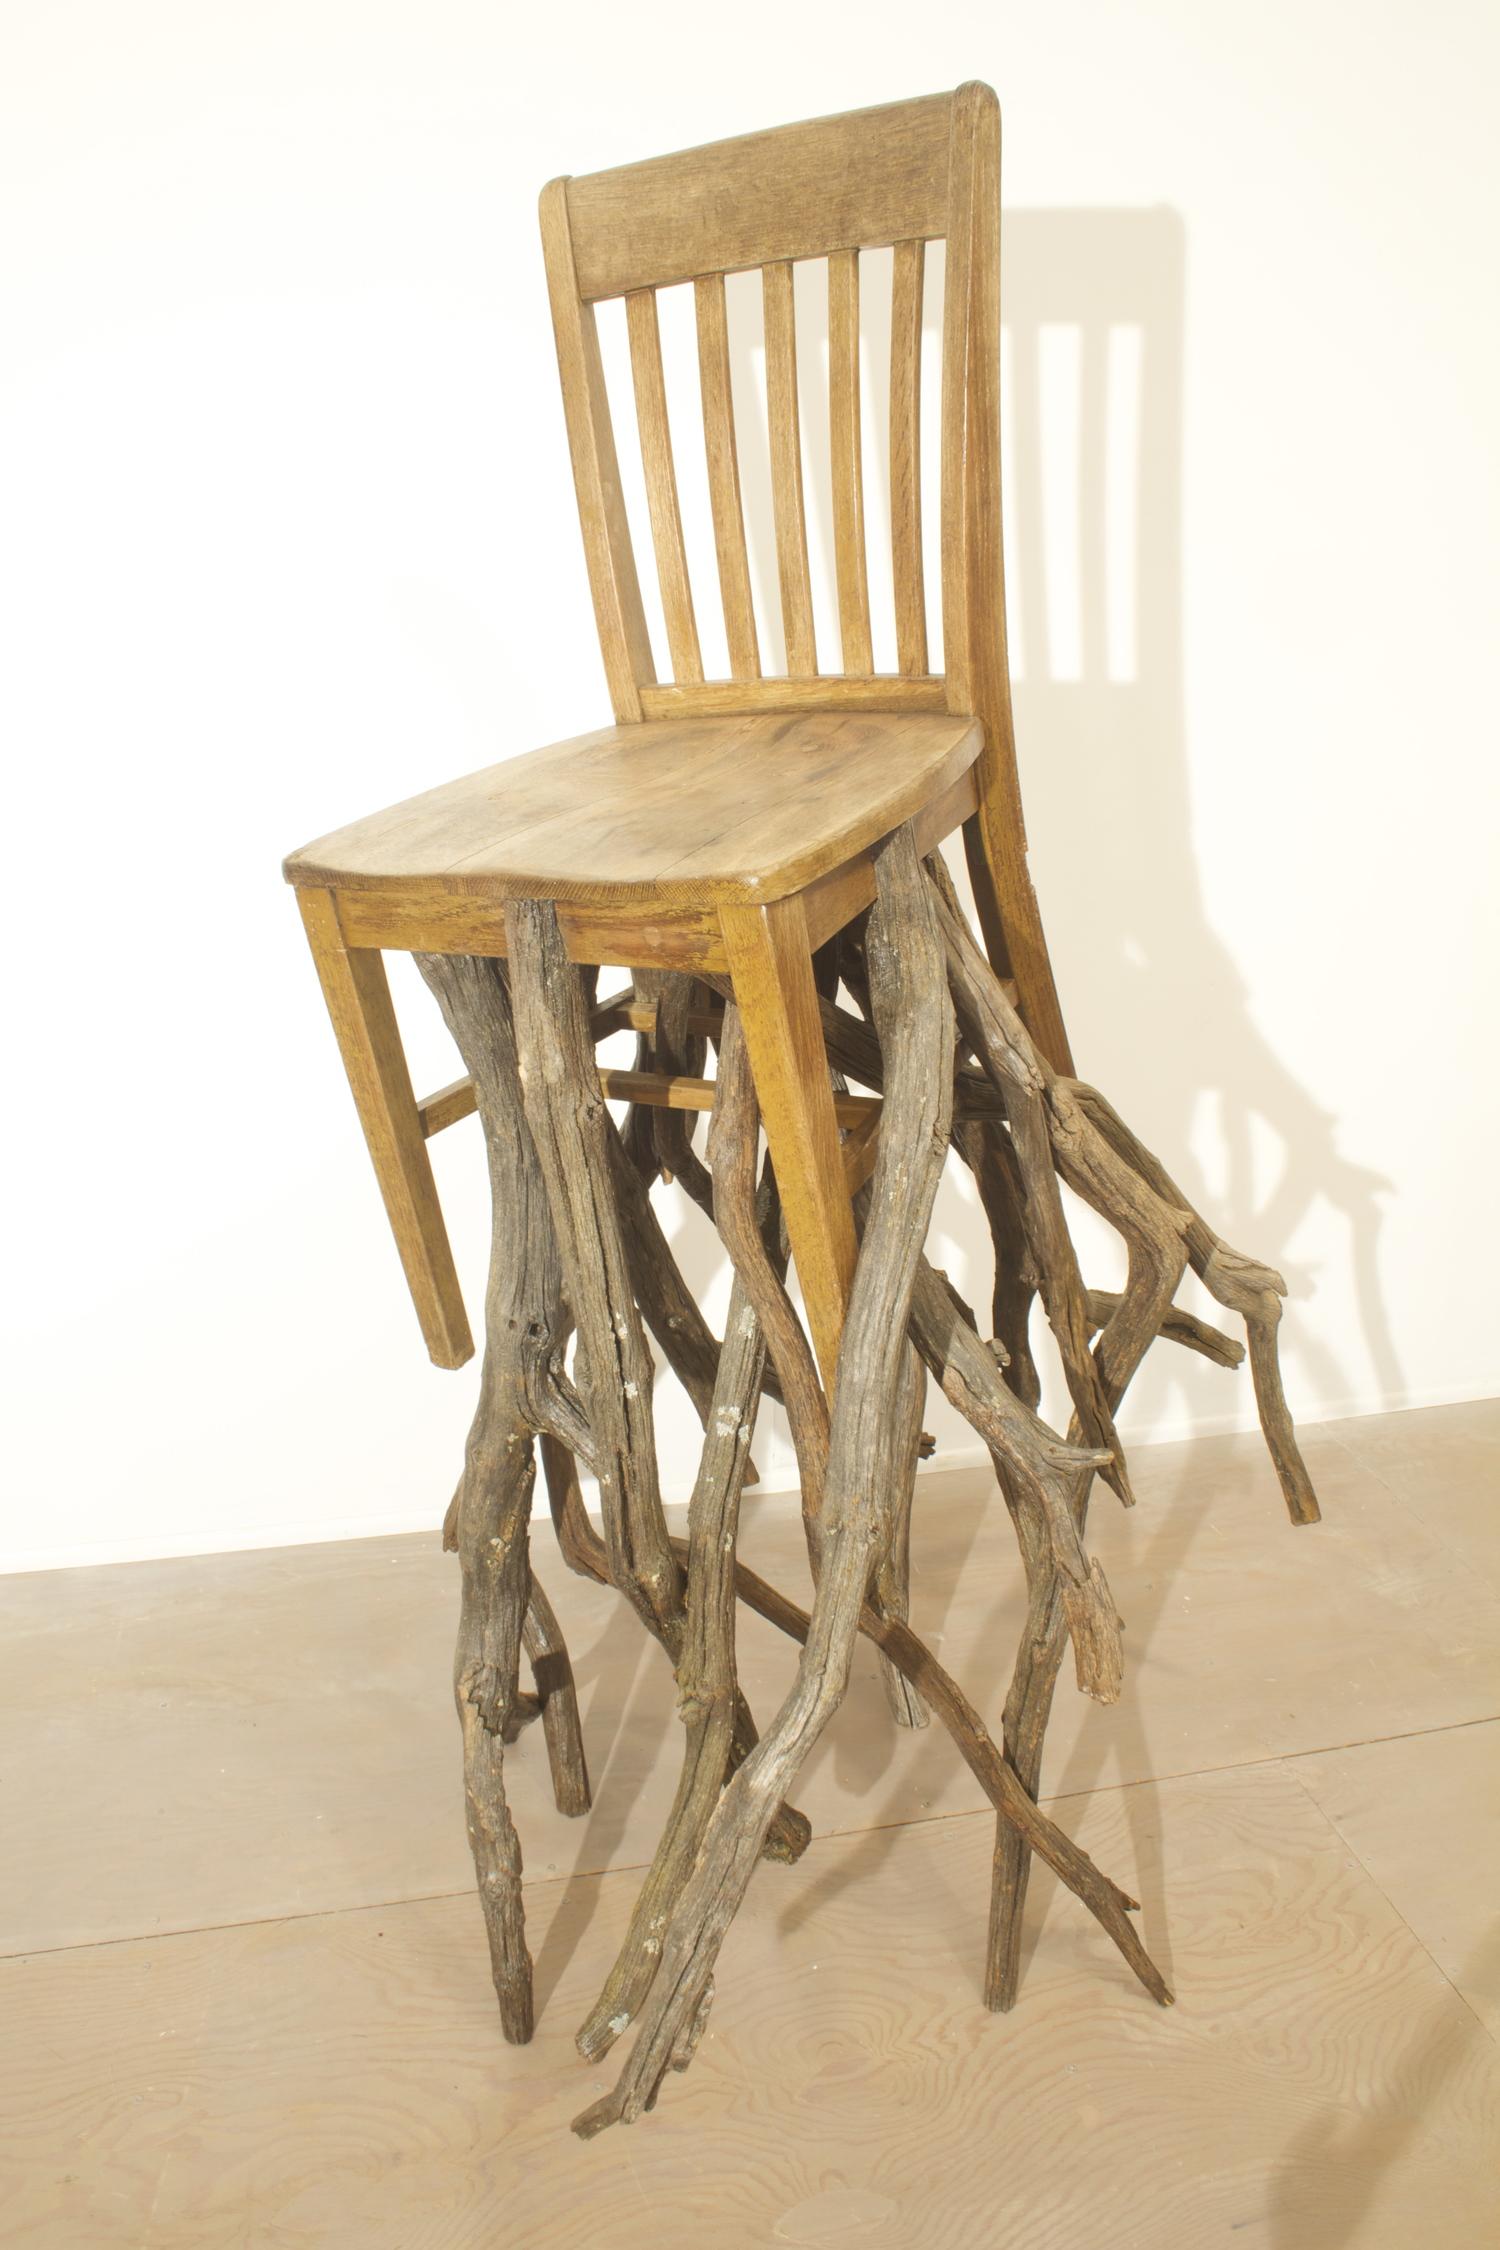 Chairs, Furniture like